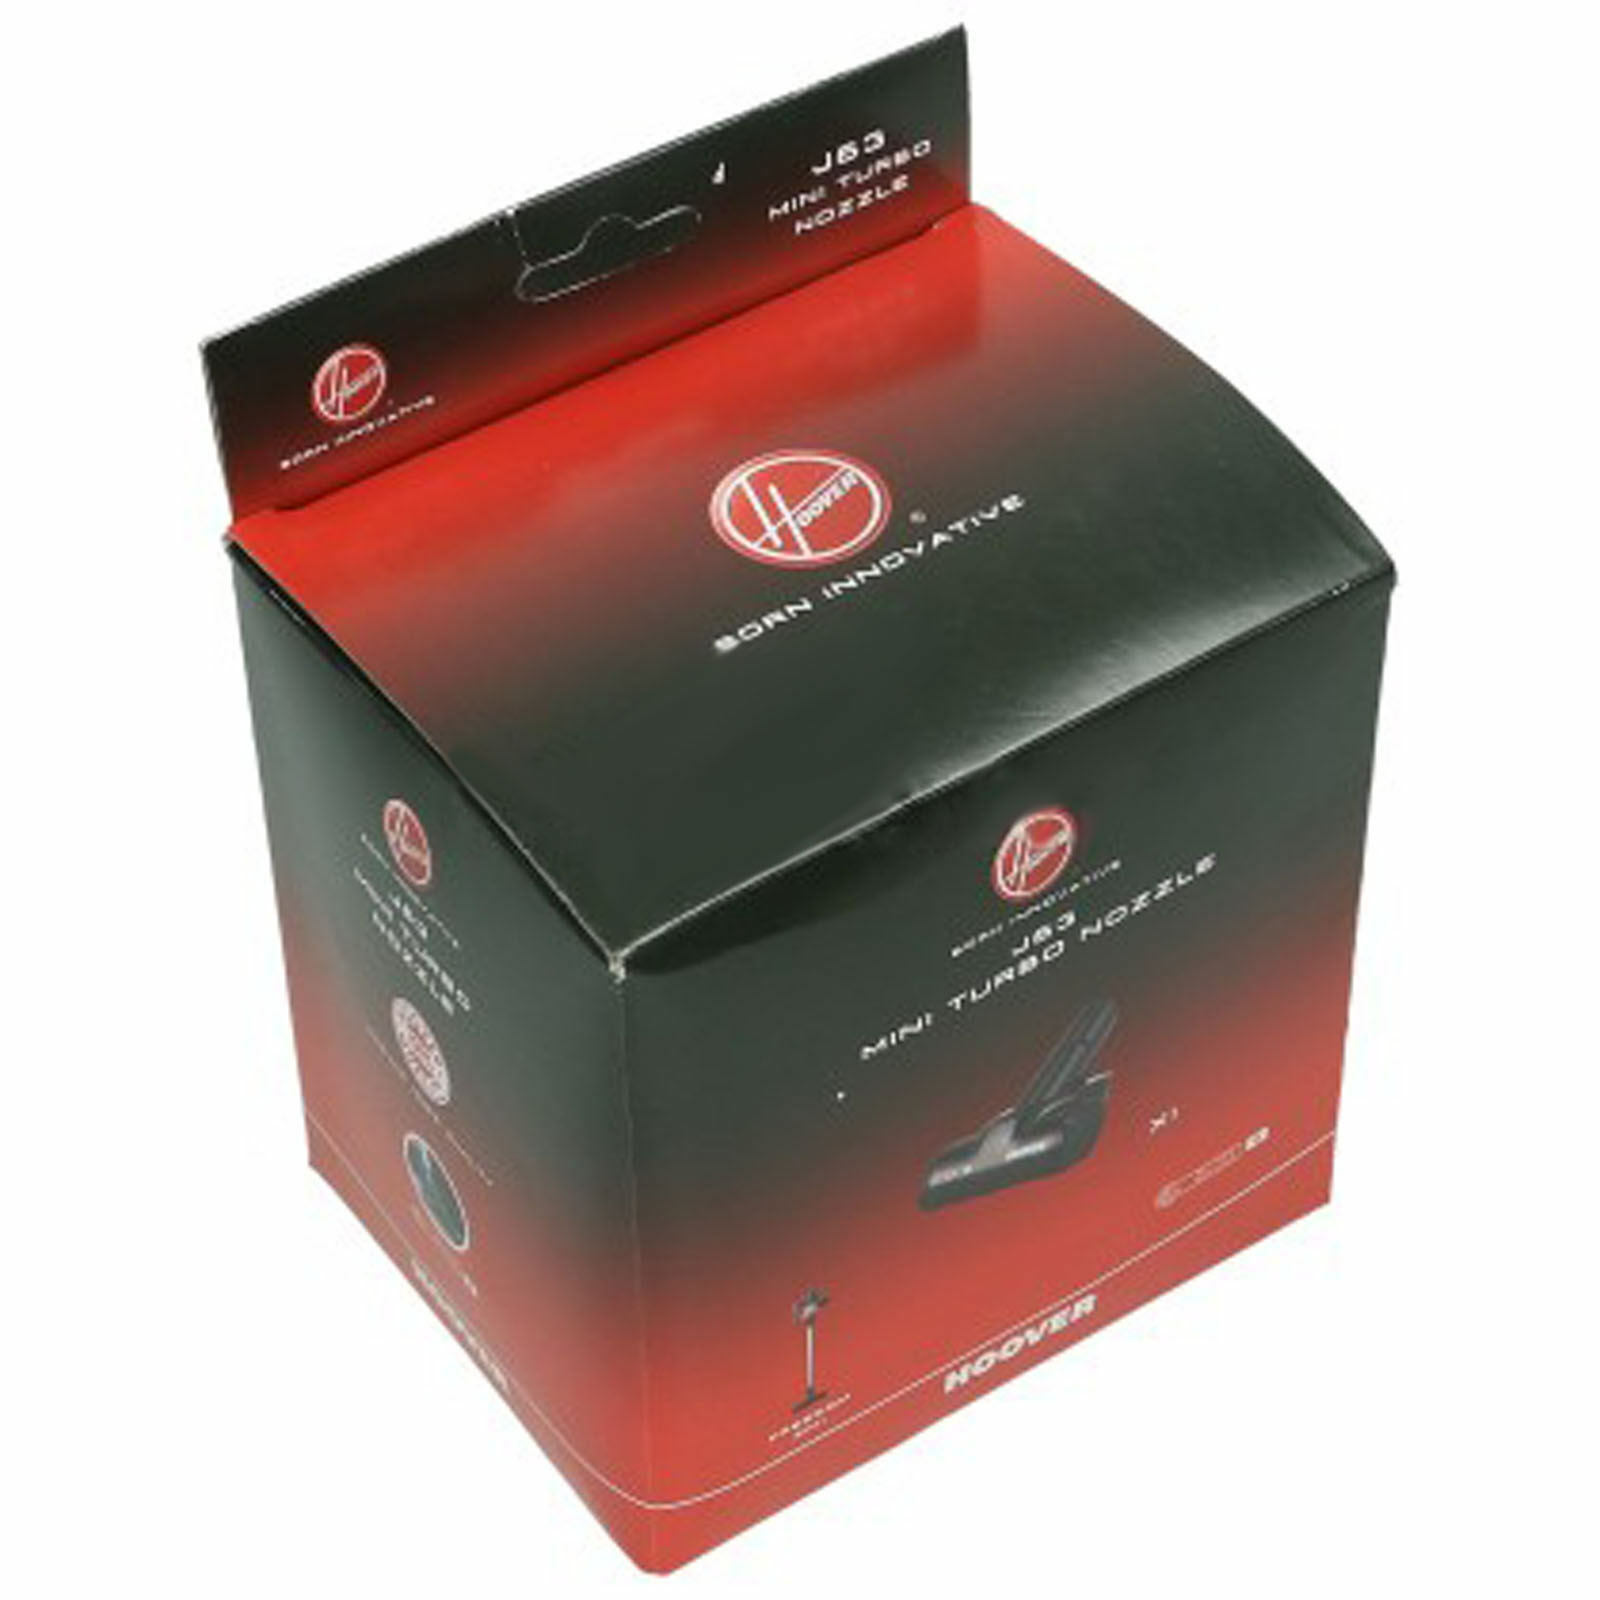 HOOVER Freedom FD22 Series Genuine Cordless Vacuum Cleaner Mini Turbo Nozzle